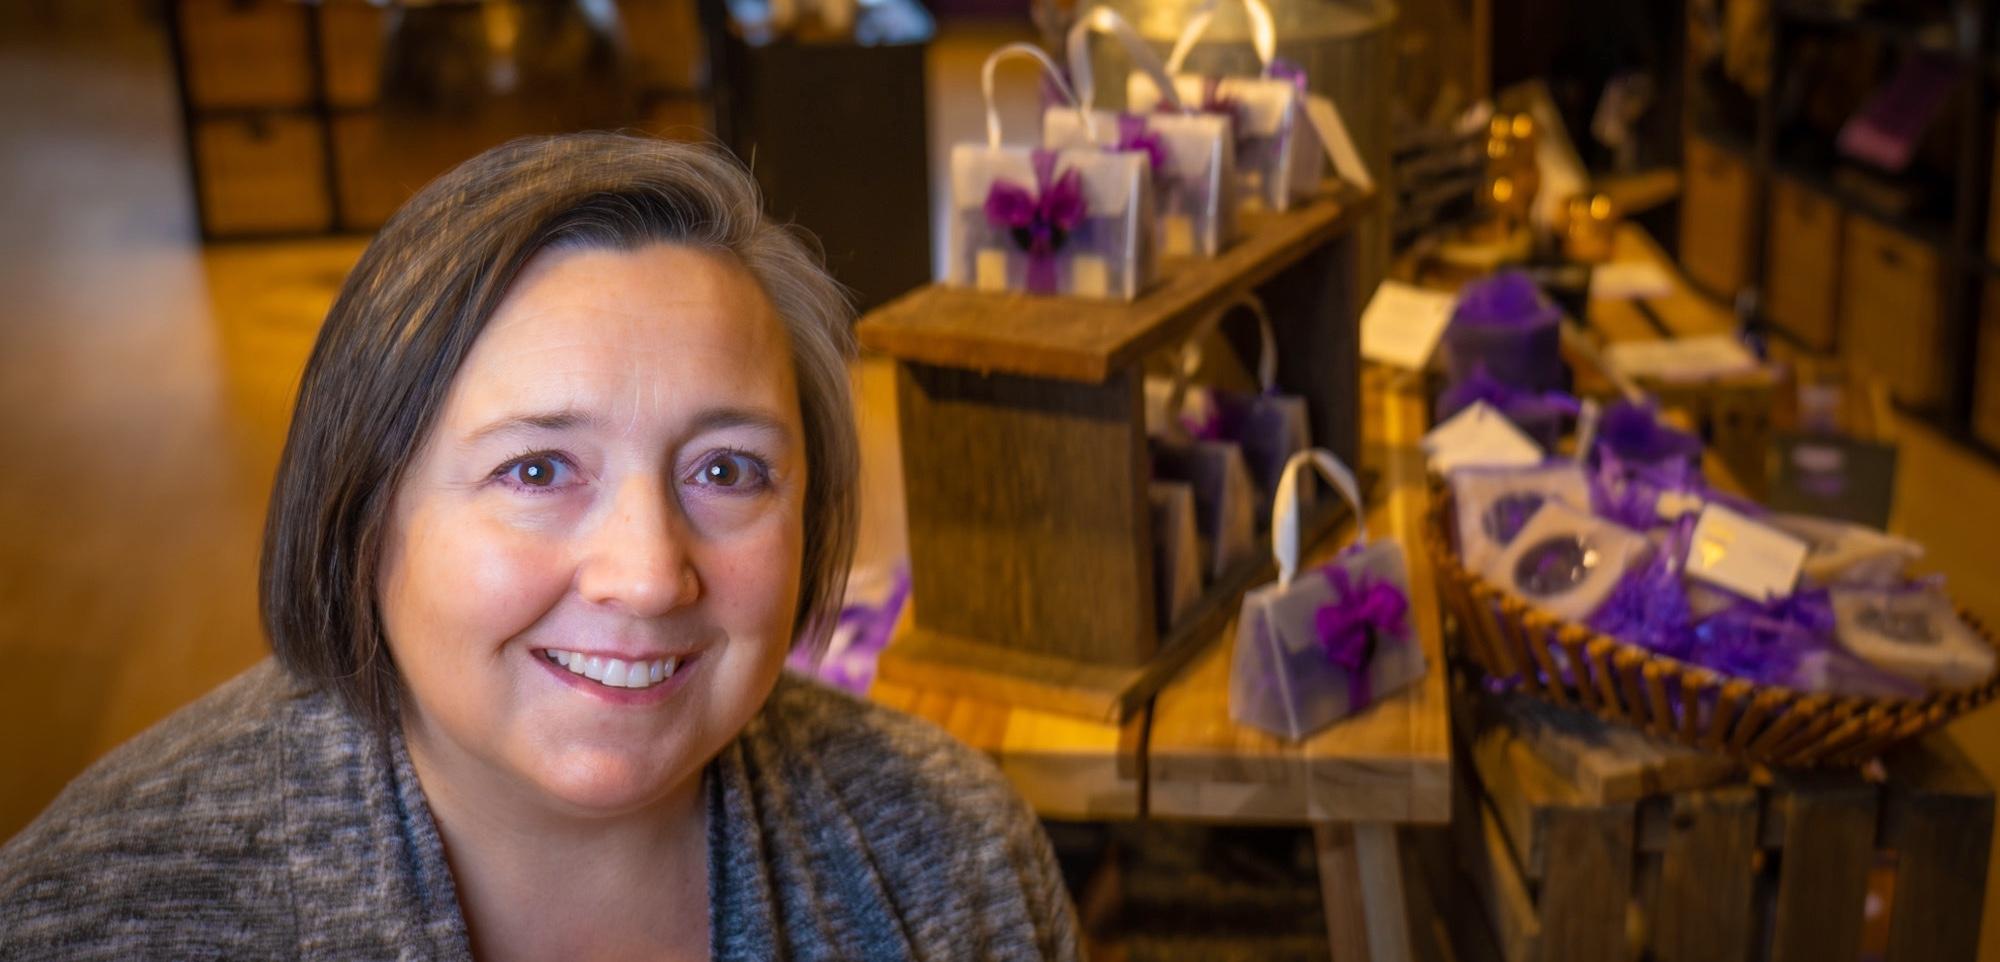 Aimee Hauff from Pelindaba Lavender